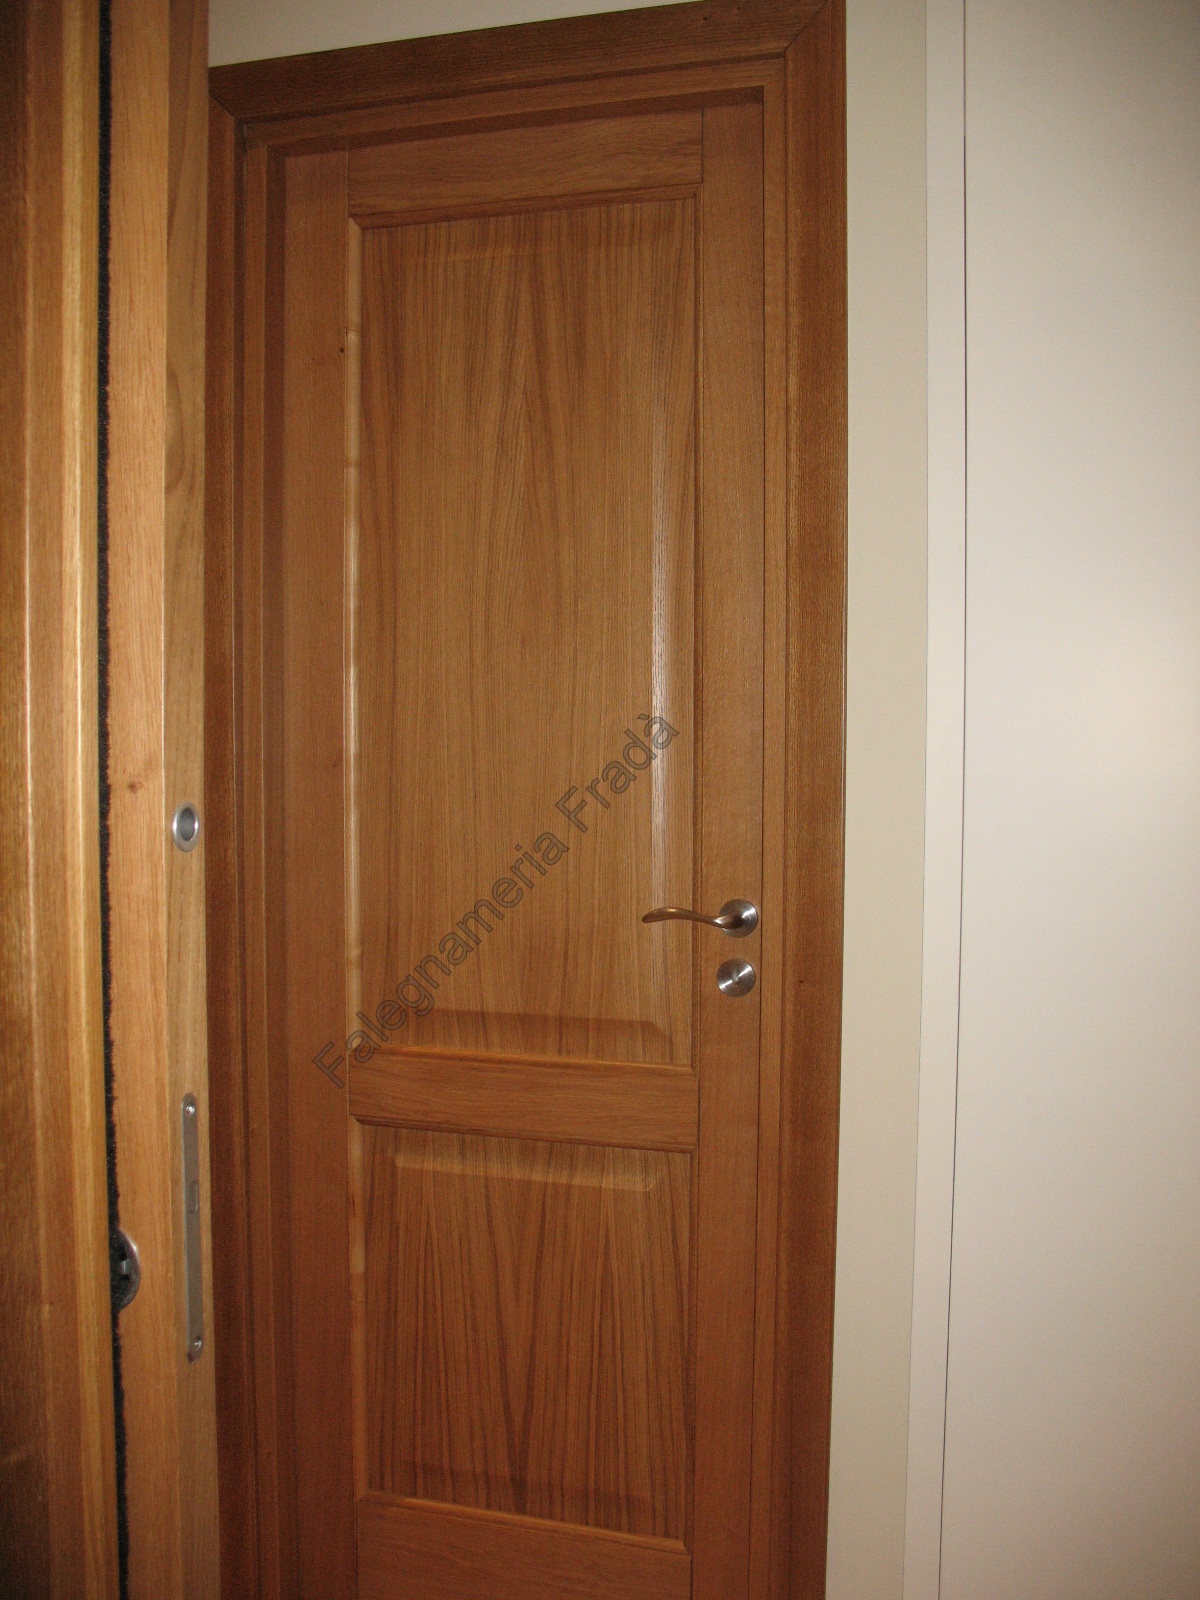 porte interne rovere - Falegnameria Fradà - falegname a palermo